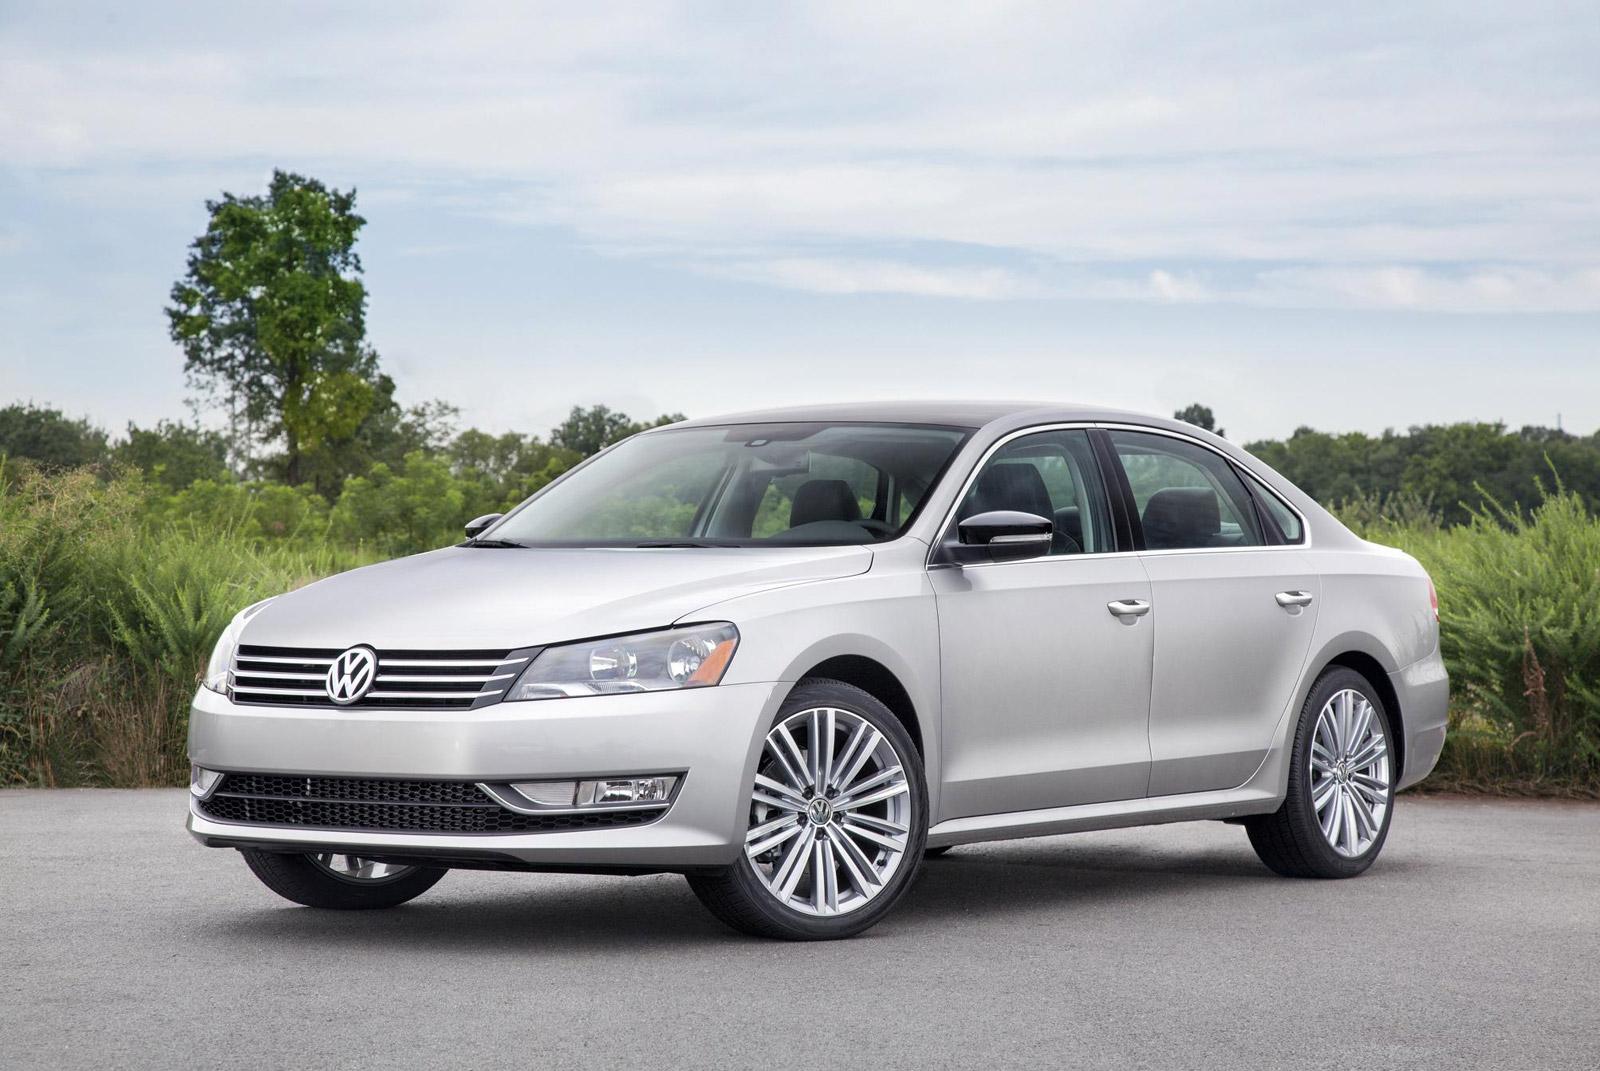 2014 Volkswagen Passat (VW) Performance Review - The Car Connection